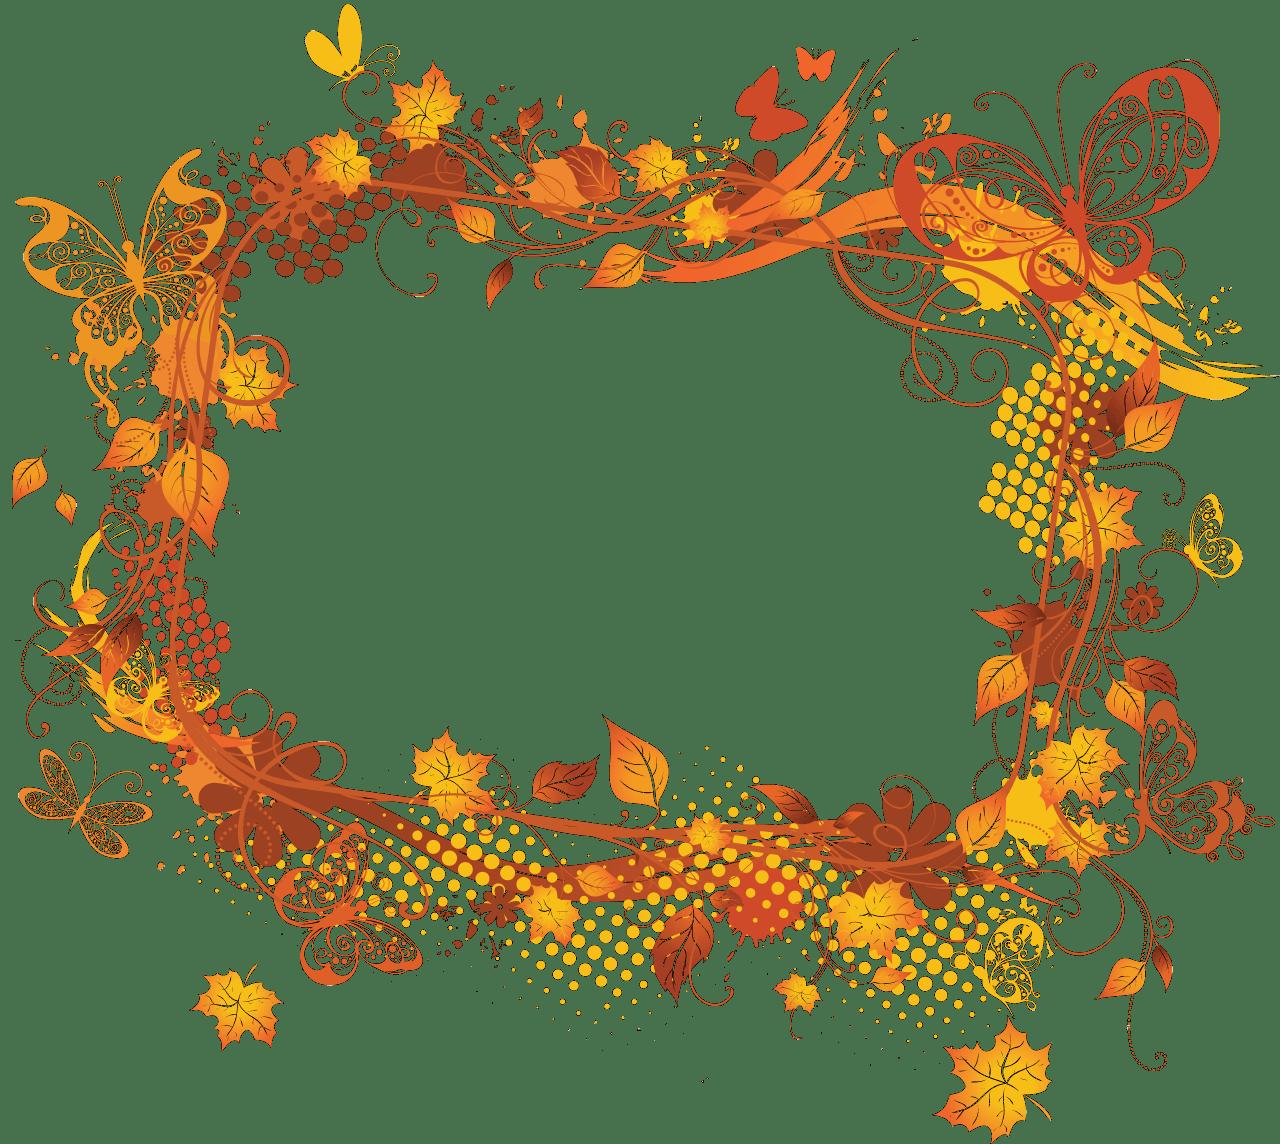 AutumnFloralPictureFrameDesign FRAMES and CORNERS 1